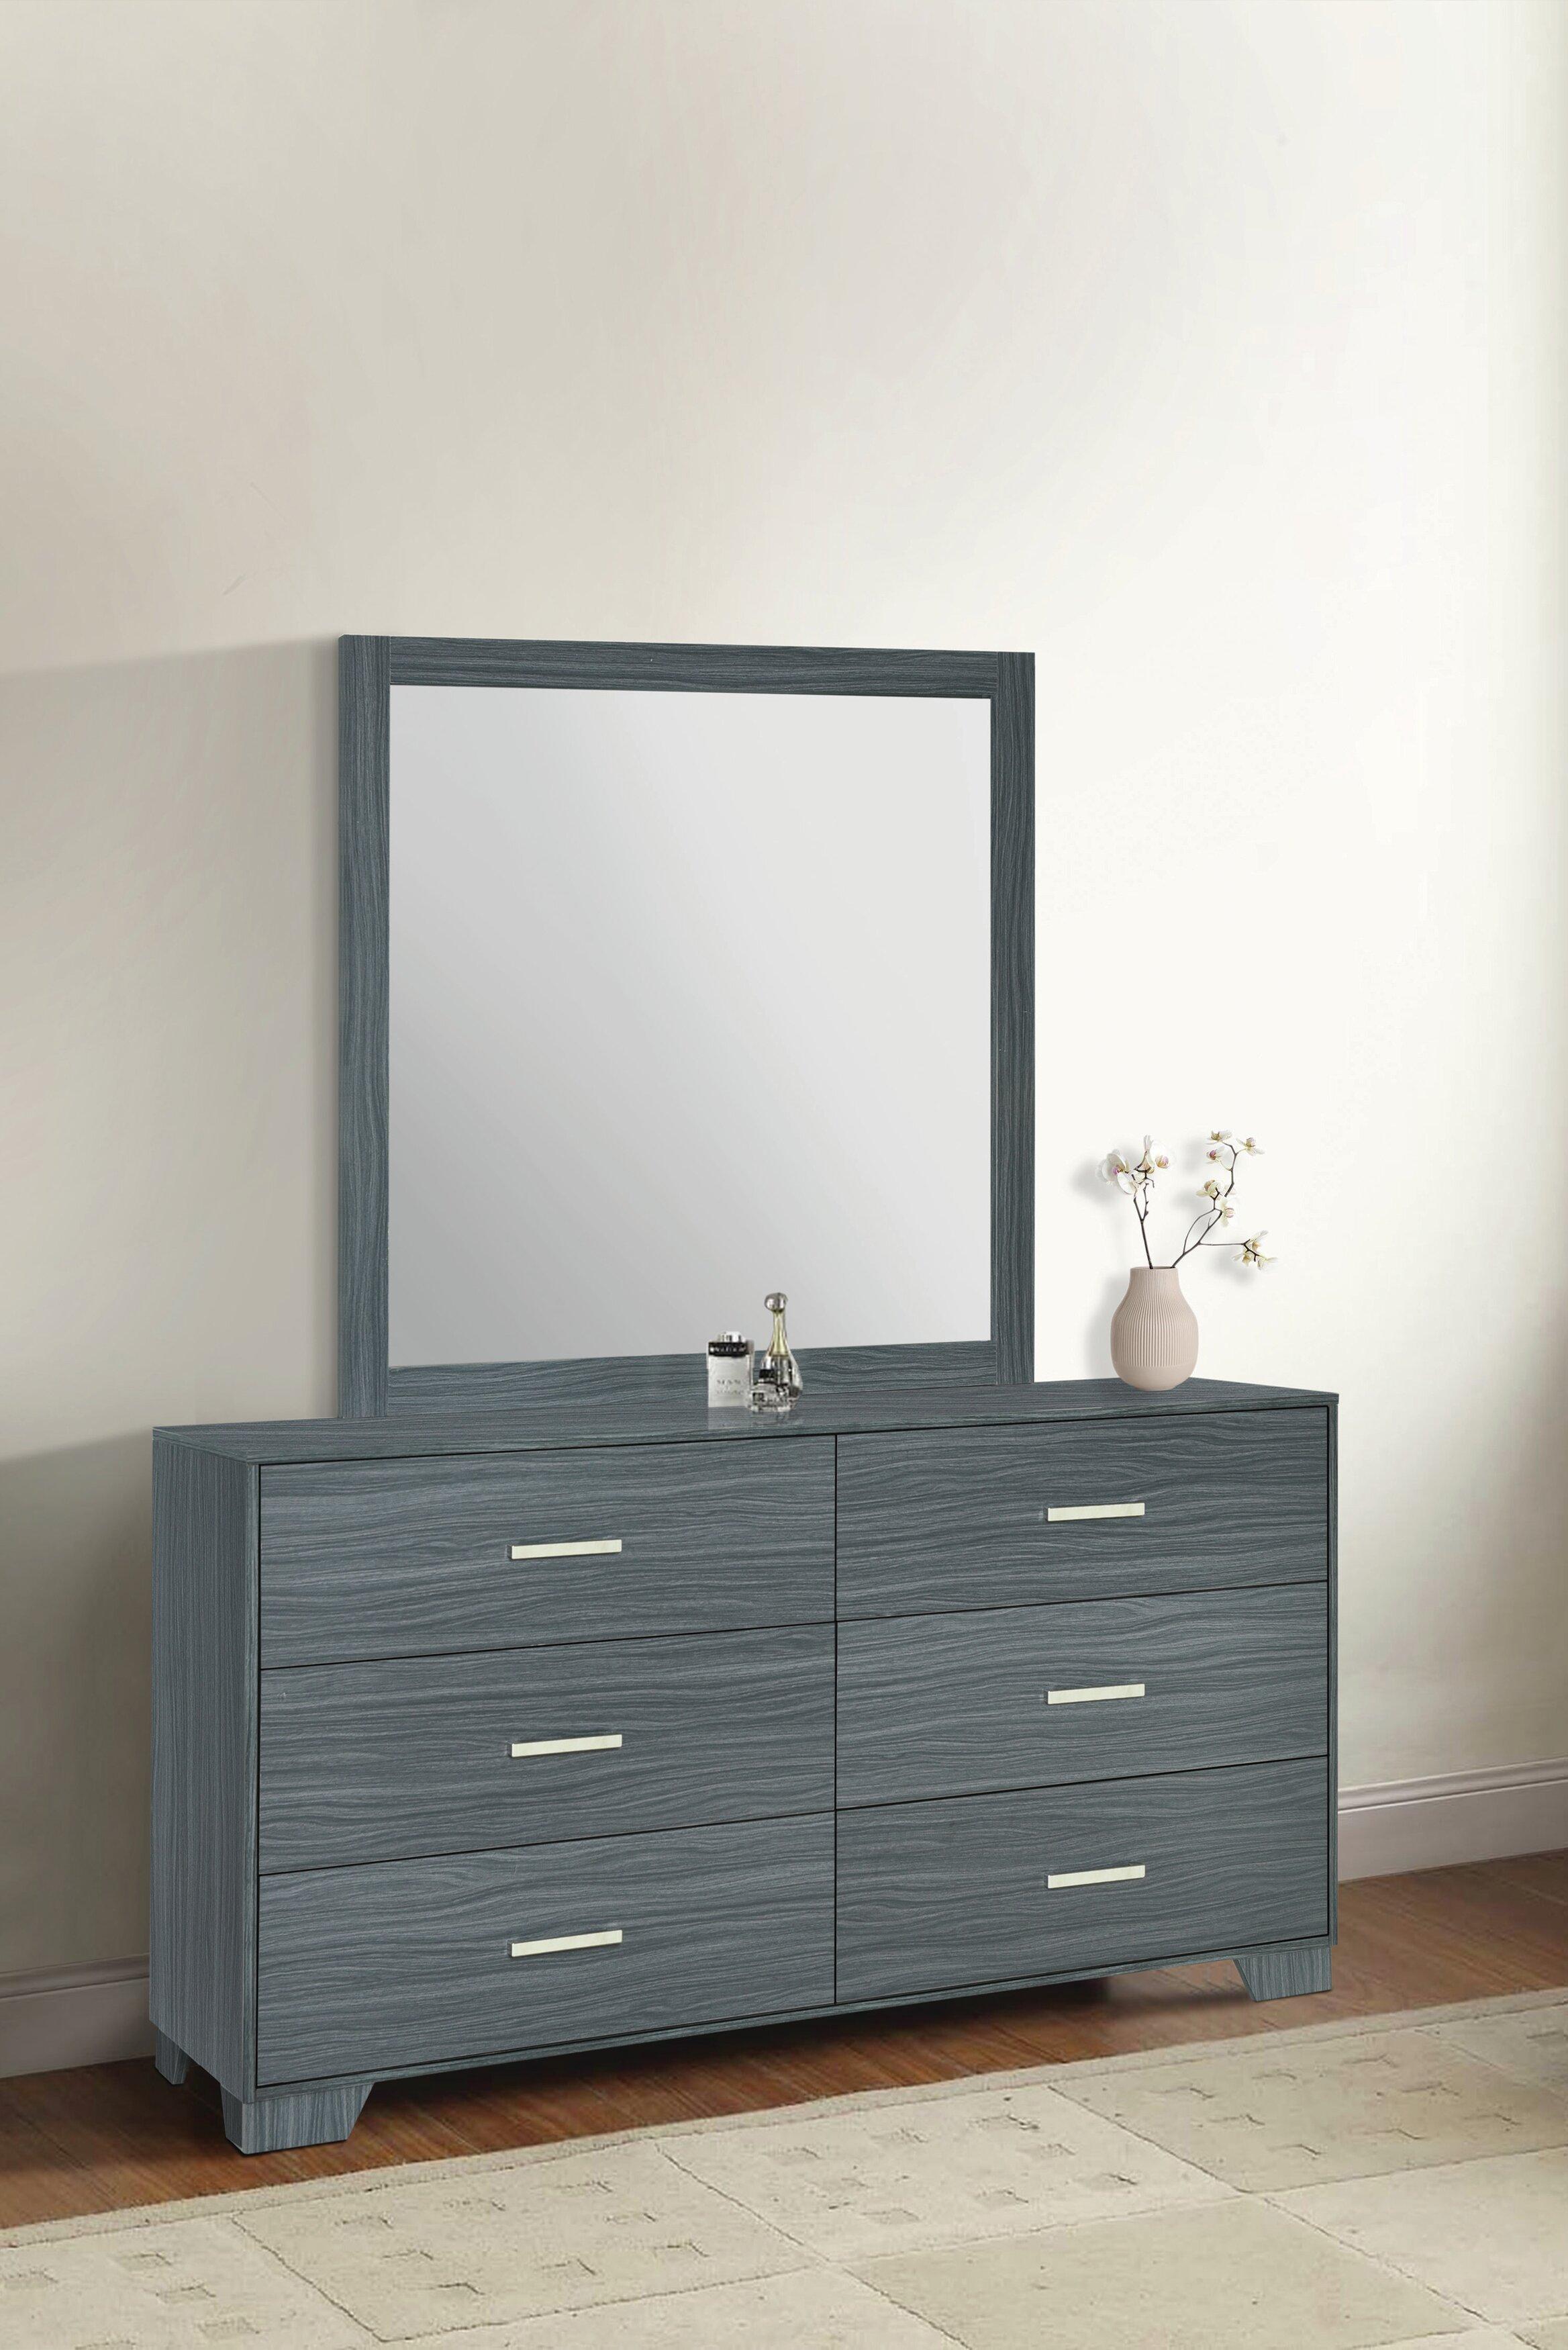 Orren Ellis Sanket 6 Drawer Double Dresser With Mirror Reviews Wayfair